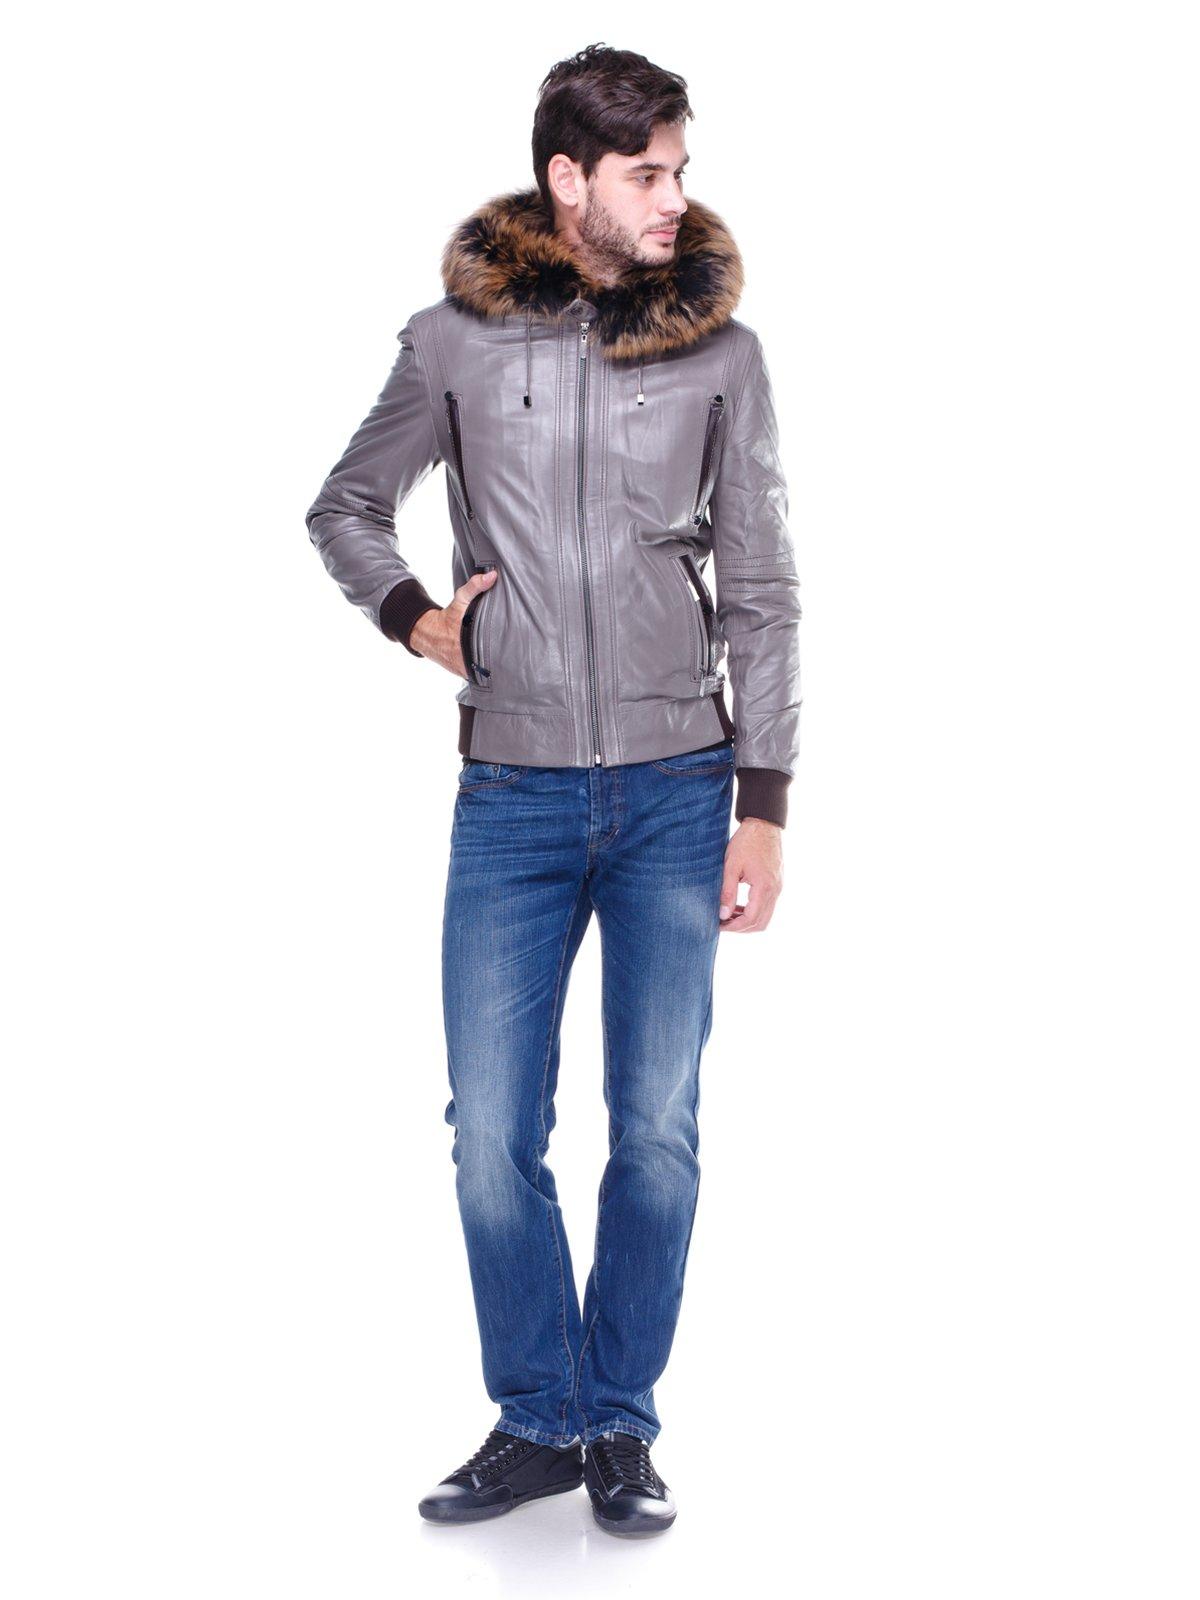 Куртка сіра з оздобленим хутром капюшоном   1830354   фото 4